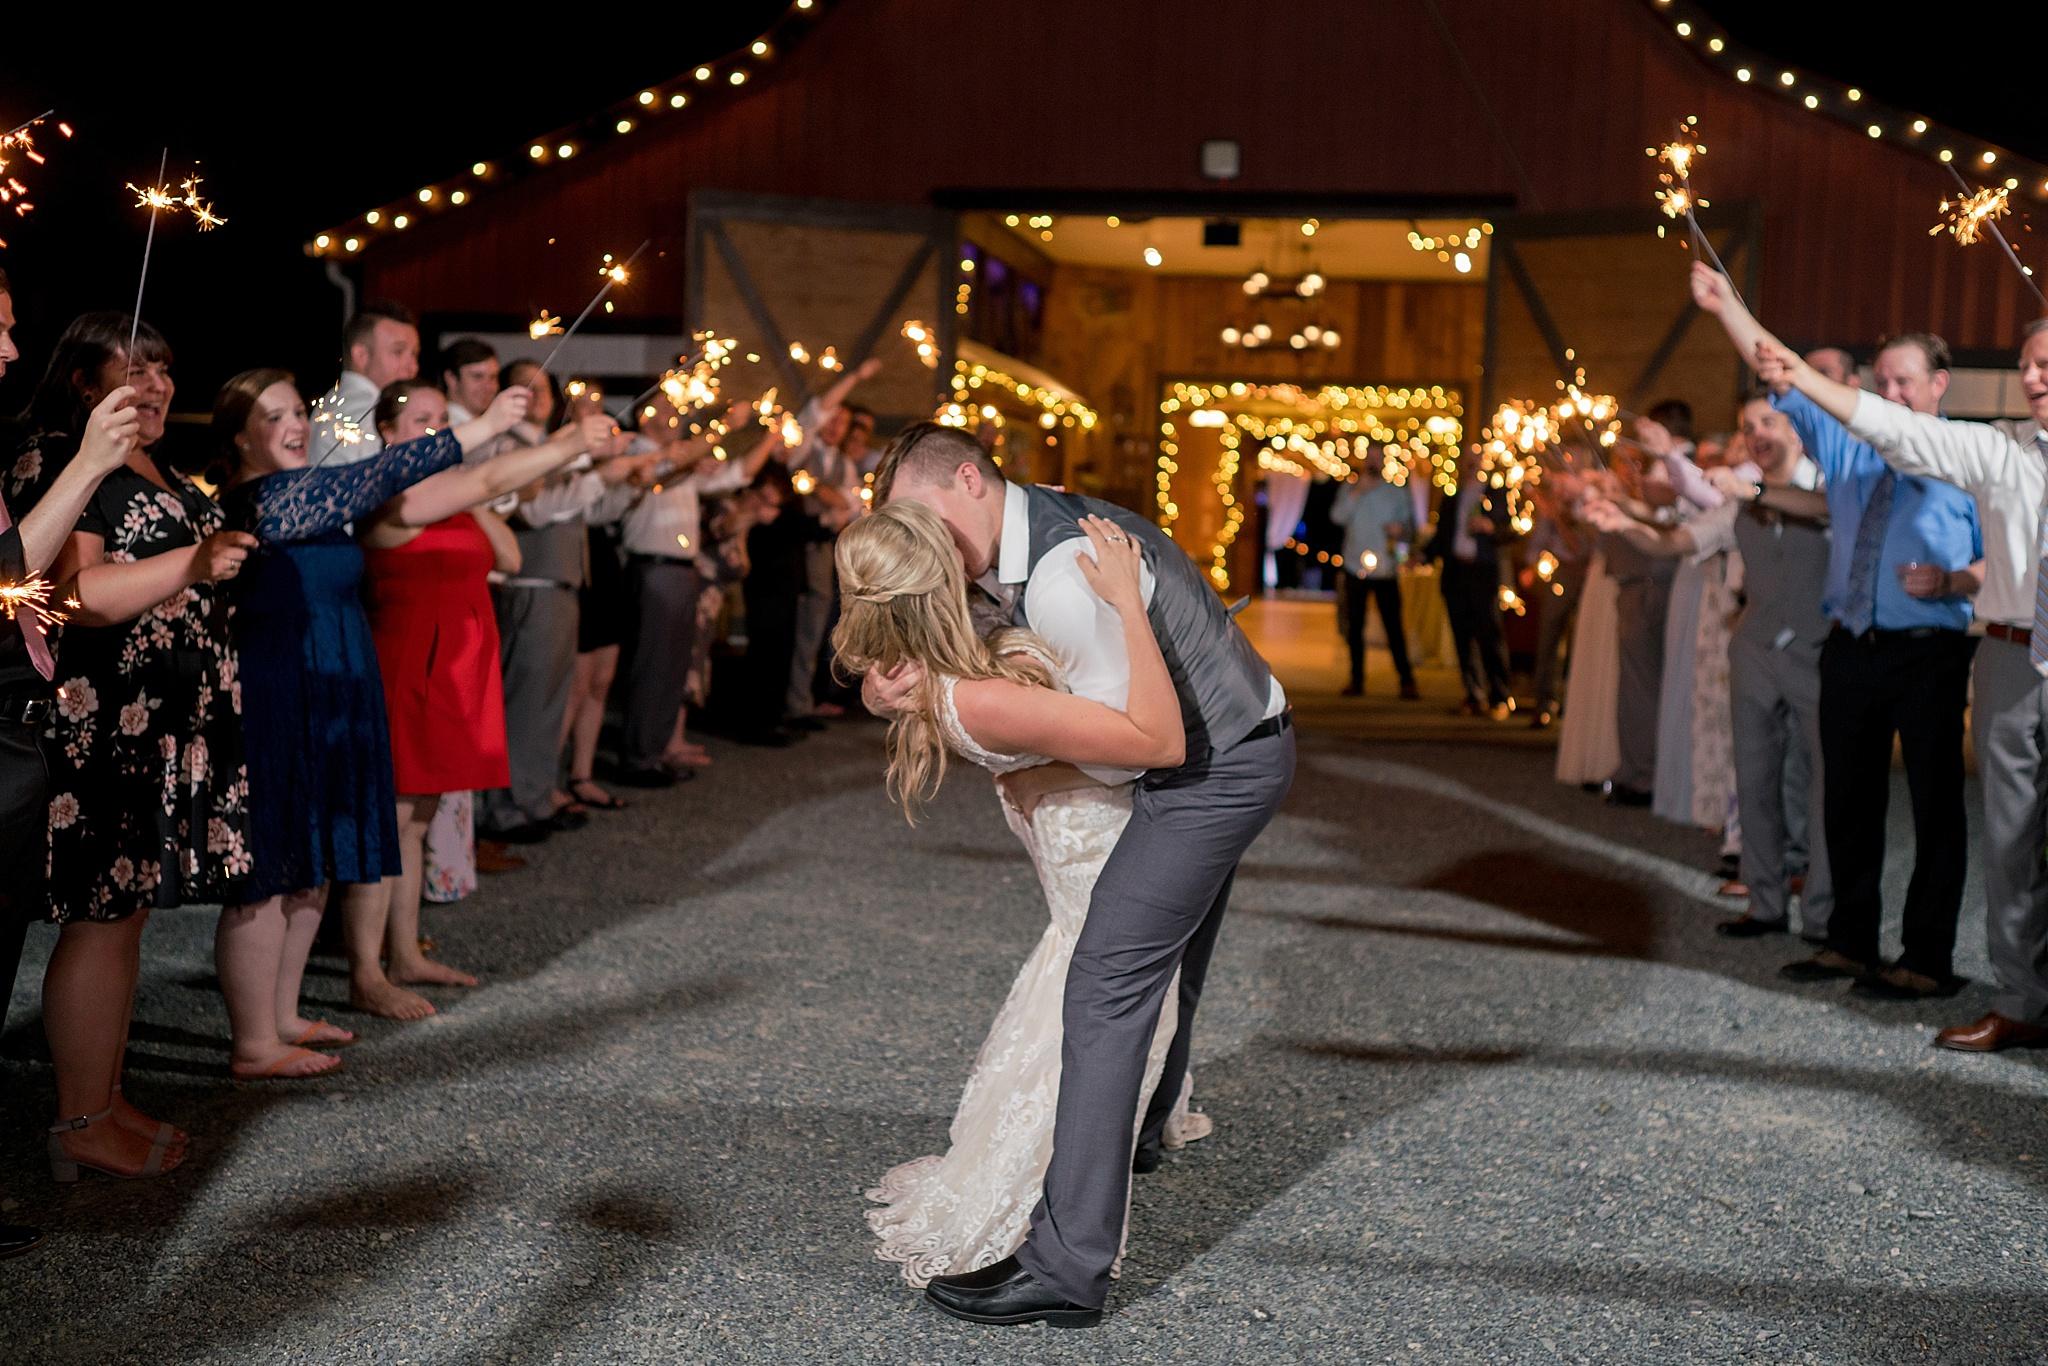 Shady-Wagon-Farm-NC-Wedding-Photographer-0205.jpg